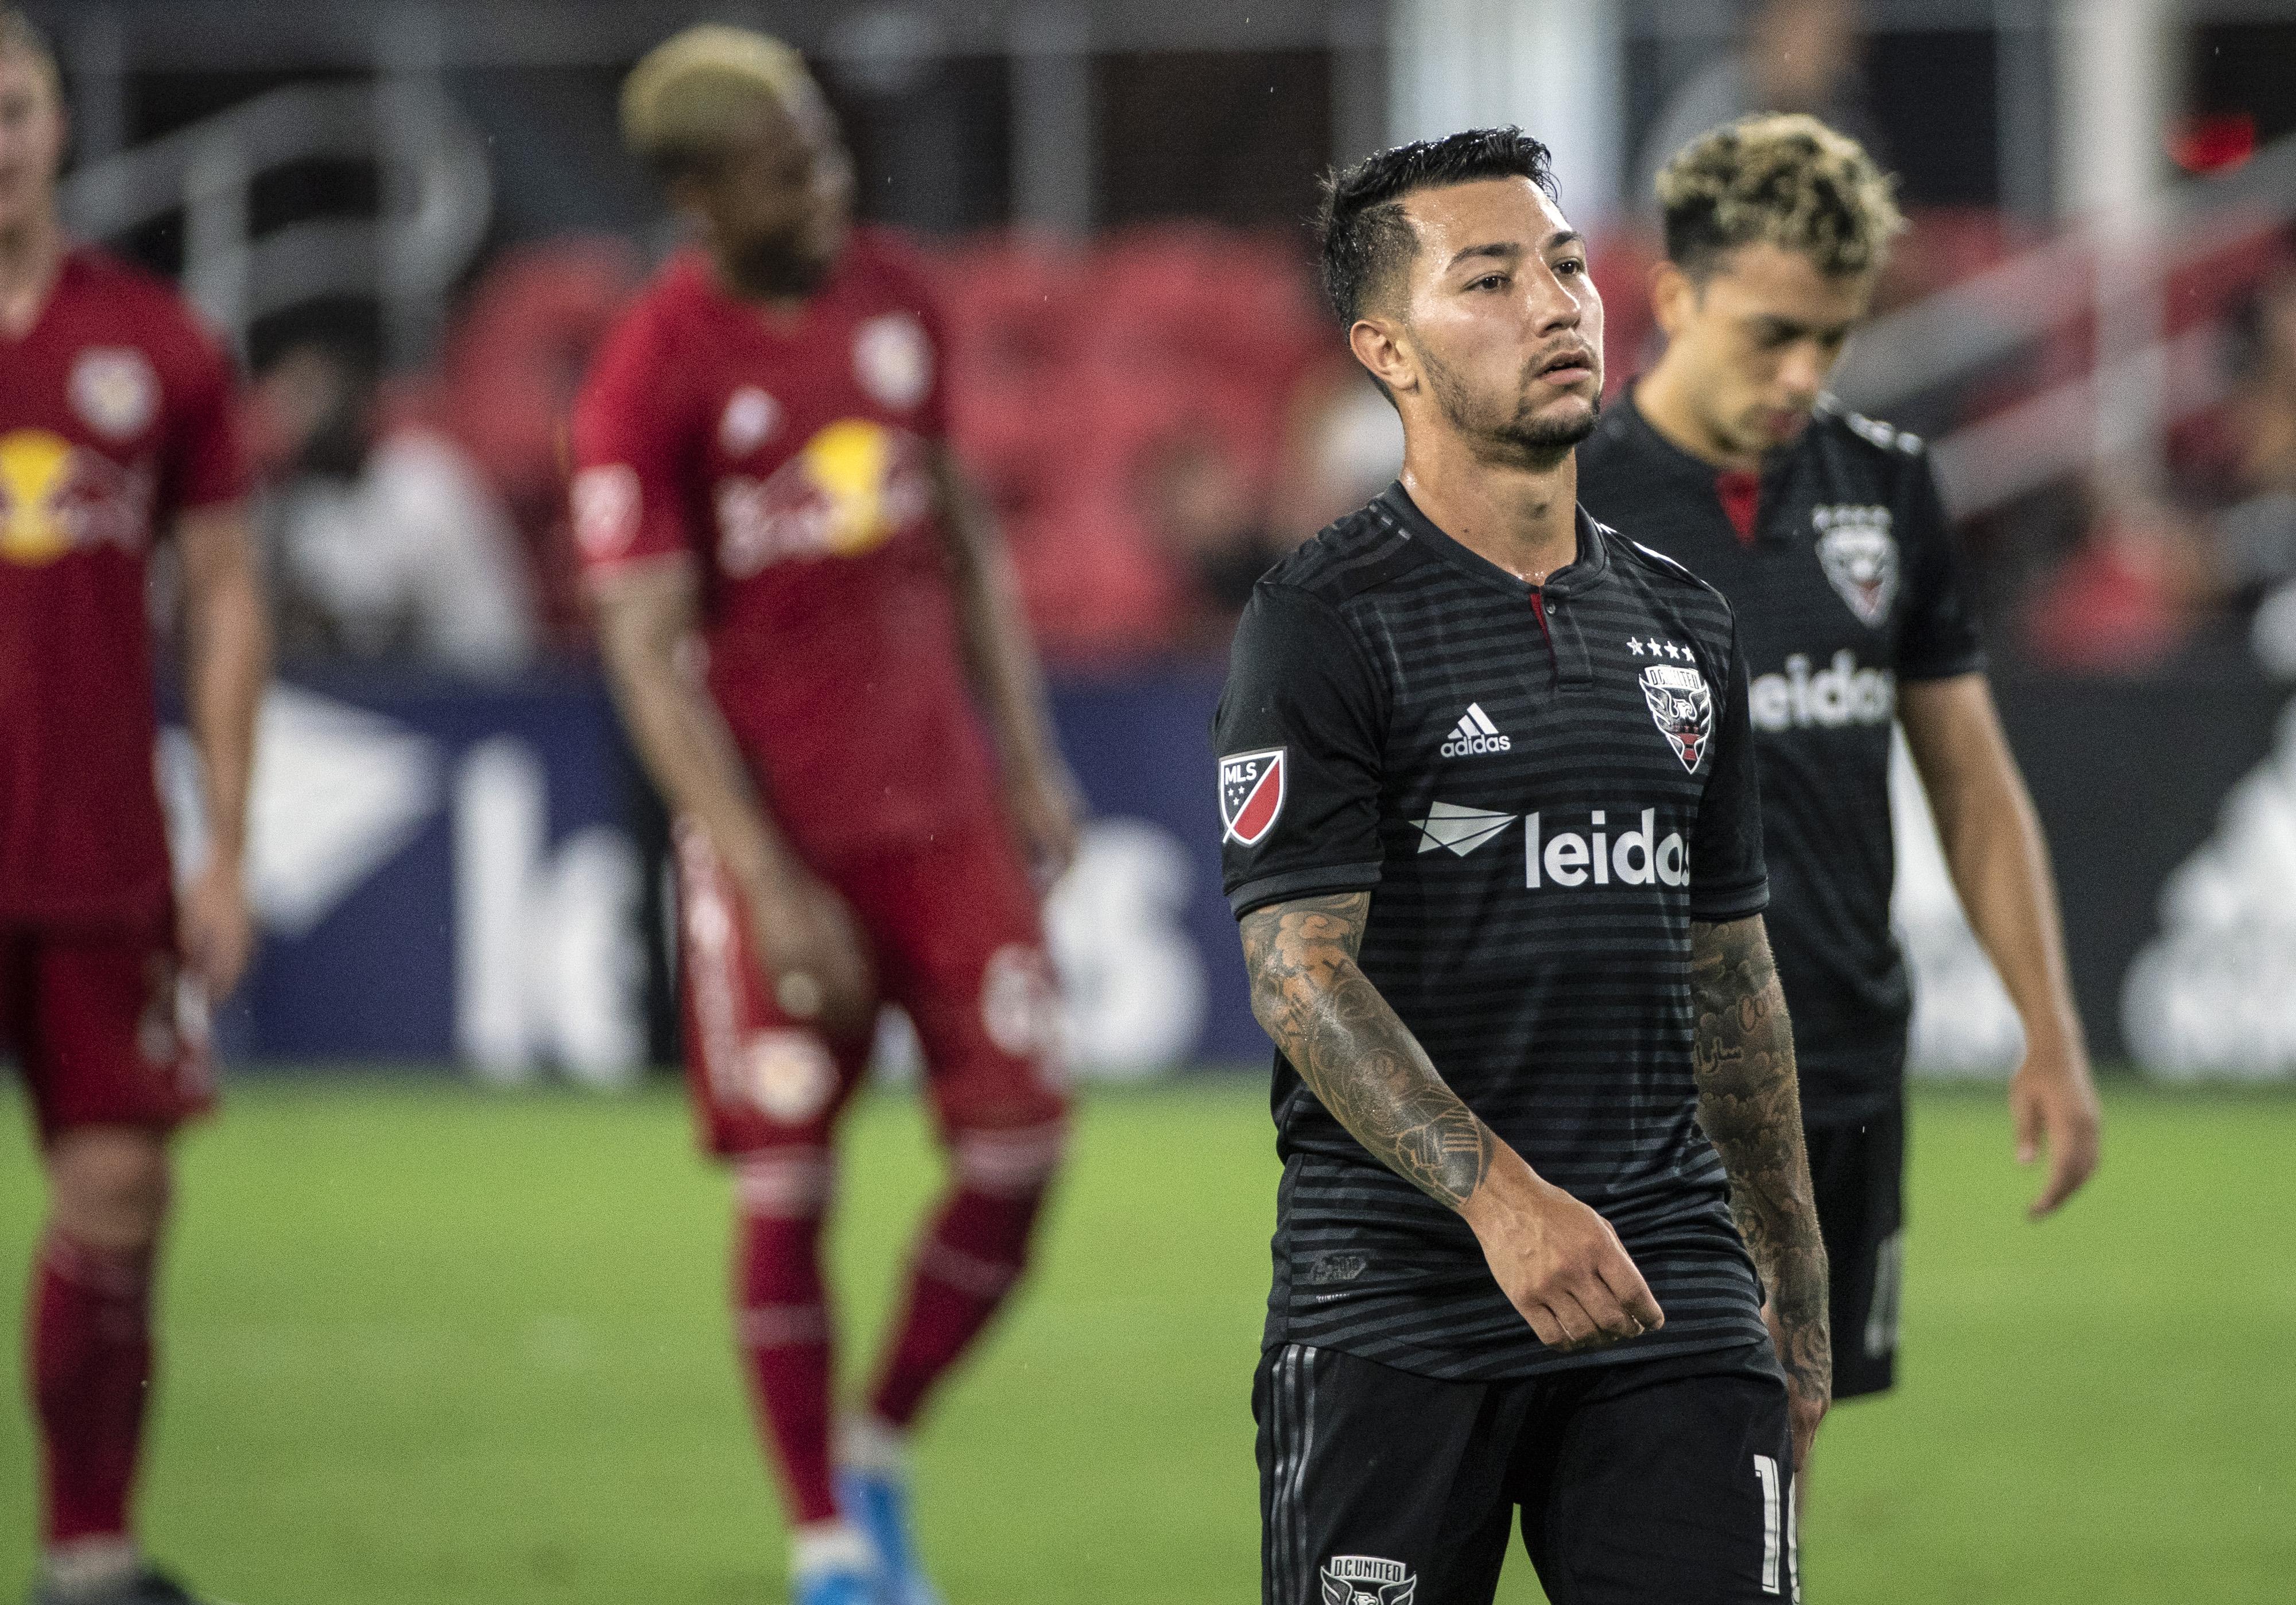 SOCCER: AUG 21 MLS - New York Red Bulls at DC United